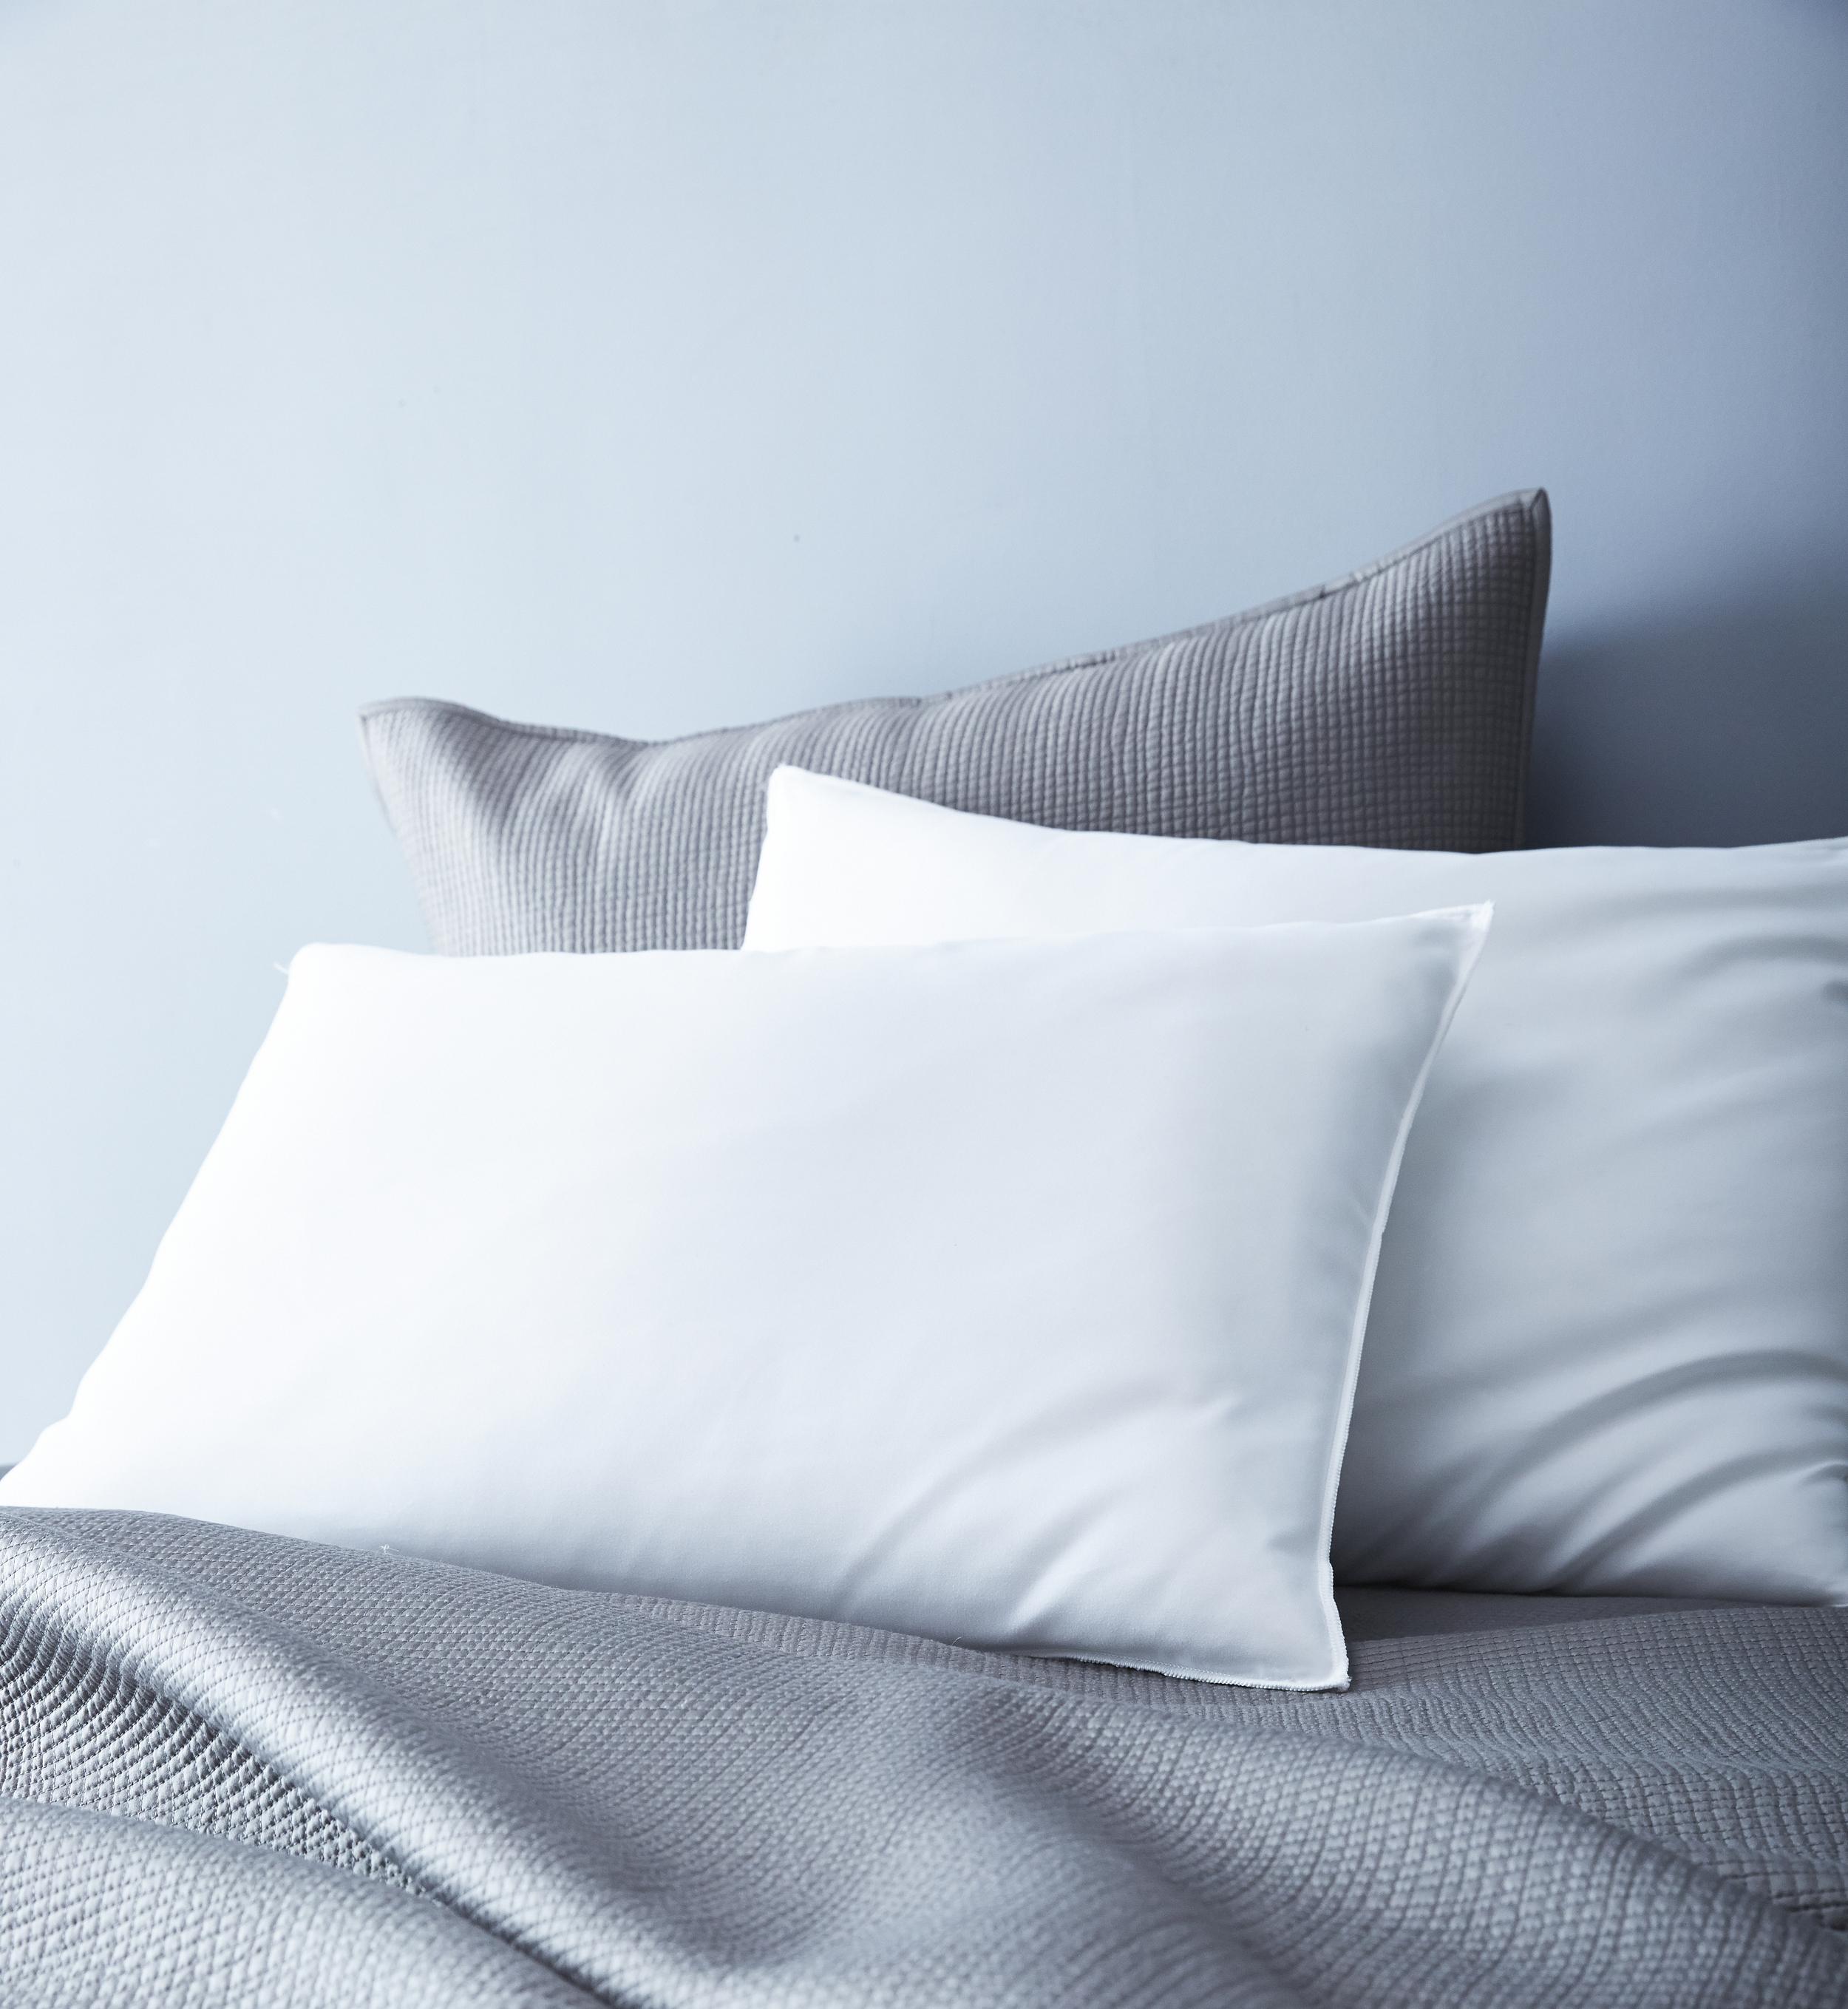 43701_Wholehome_2pk_pillow.jpg